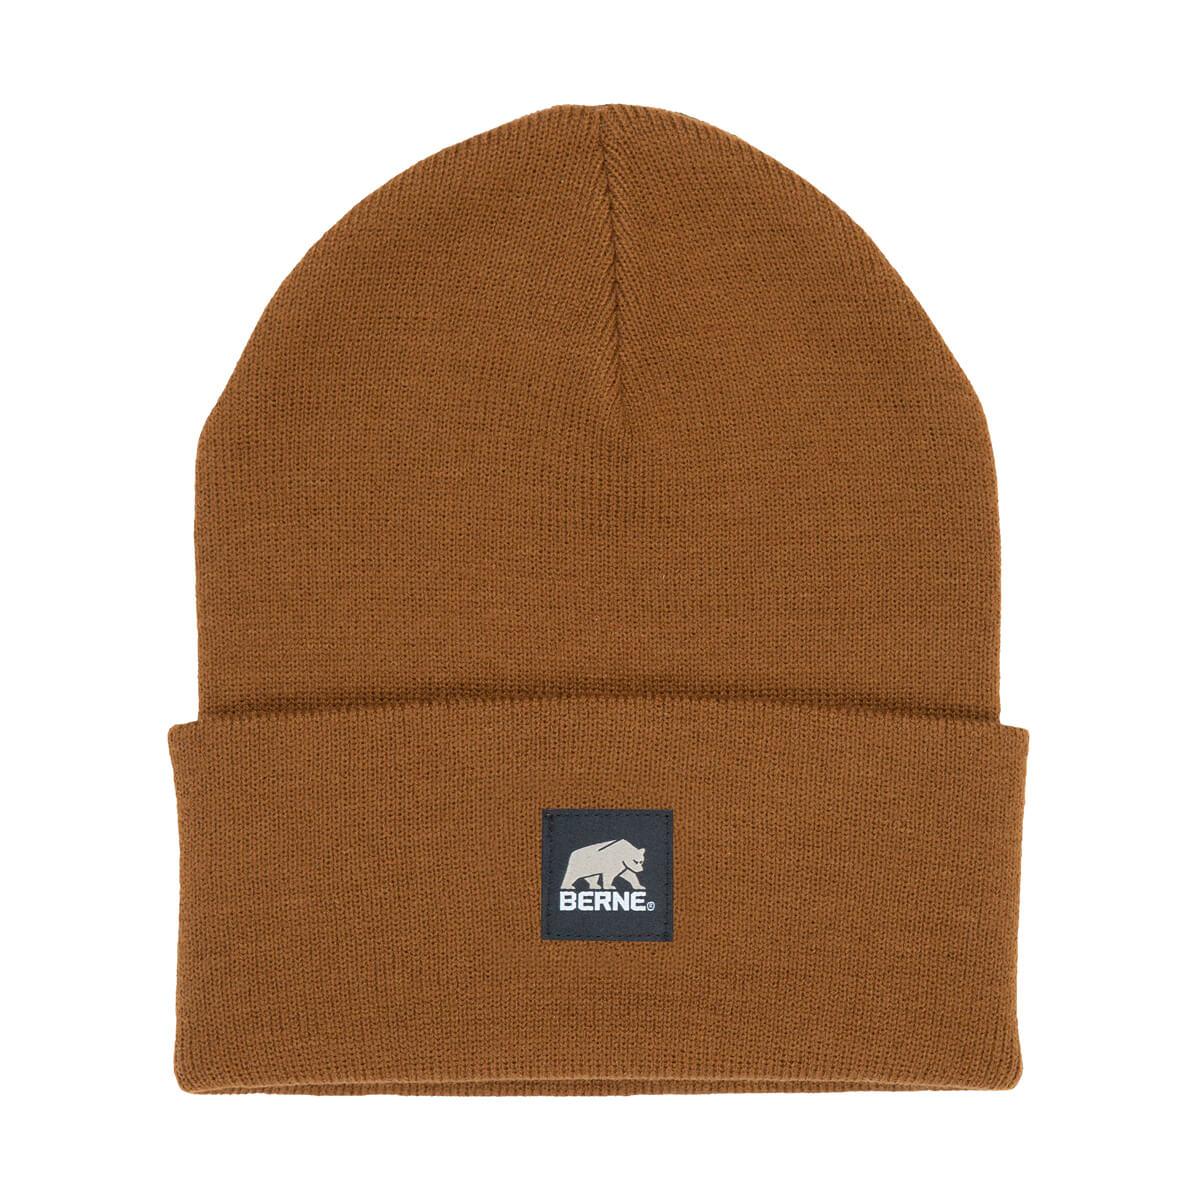 Men's Heritage Knit Cuff Cap